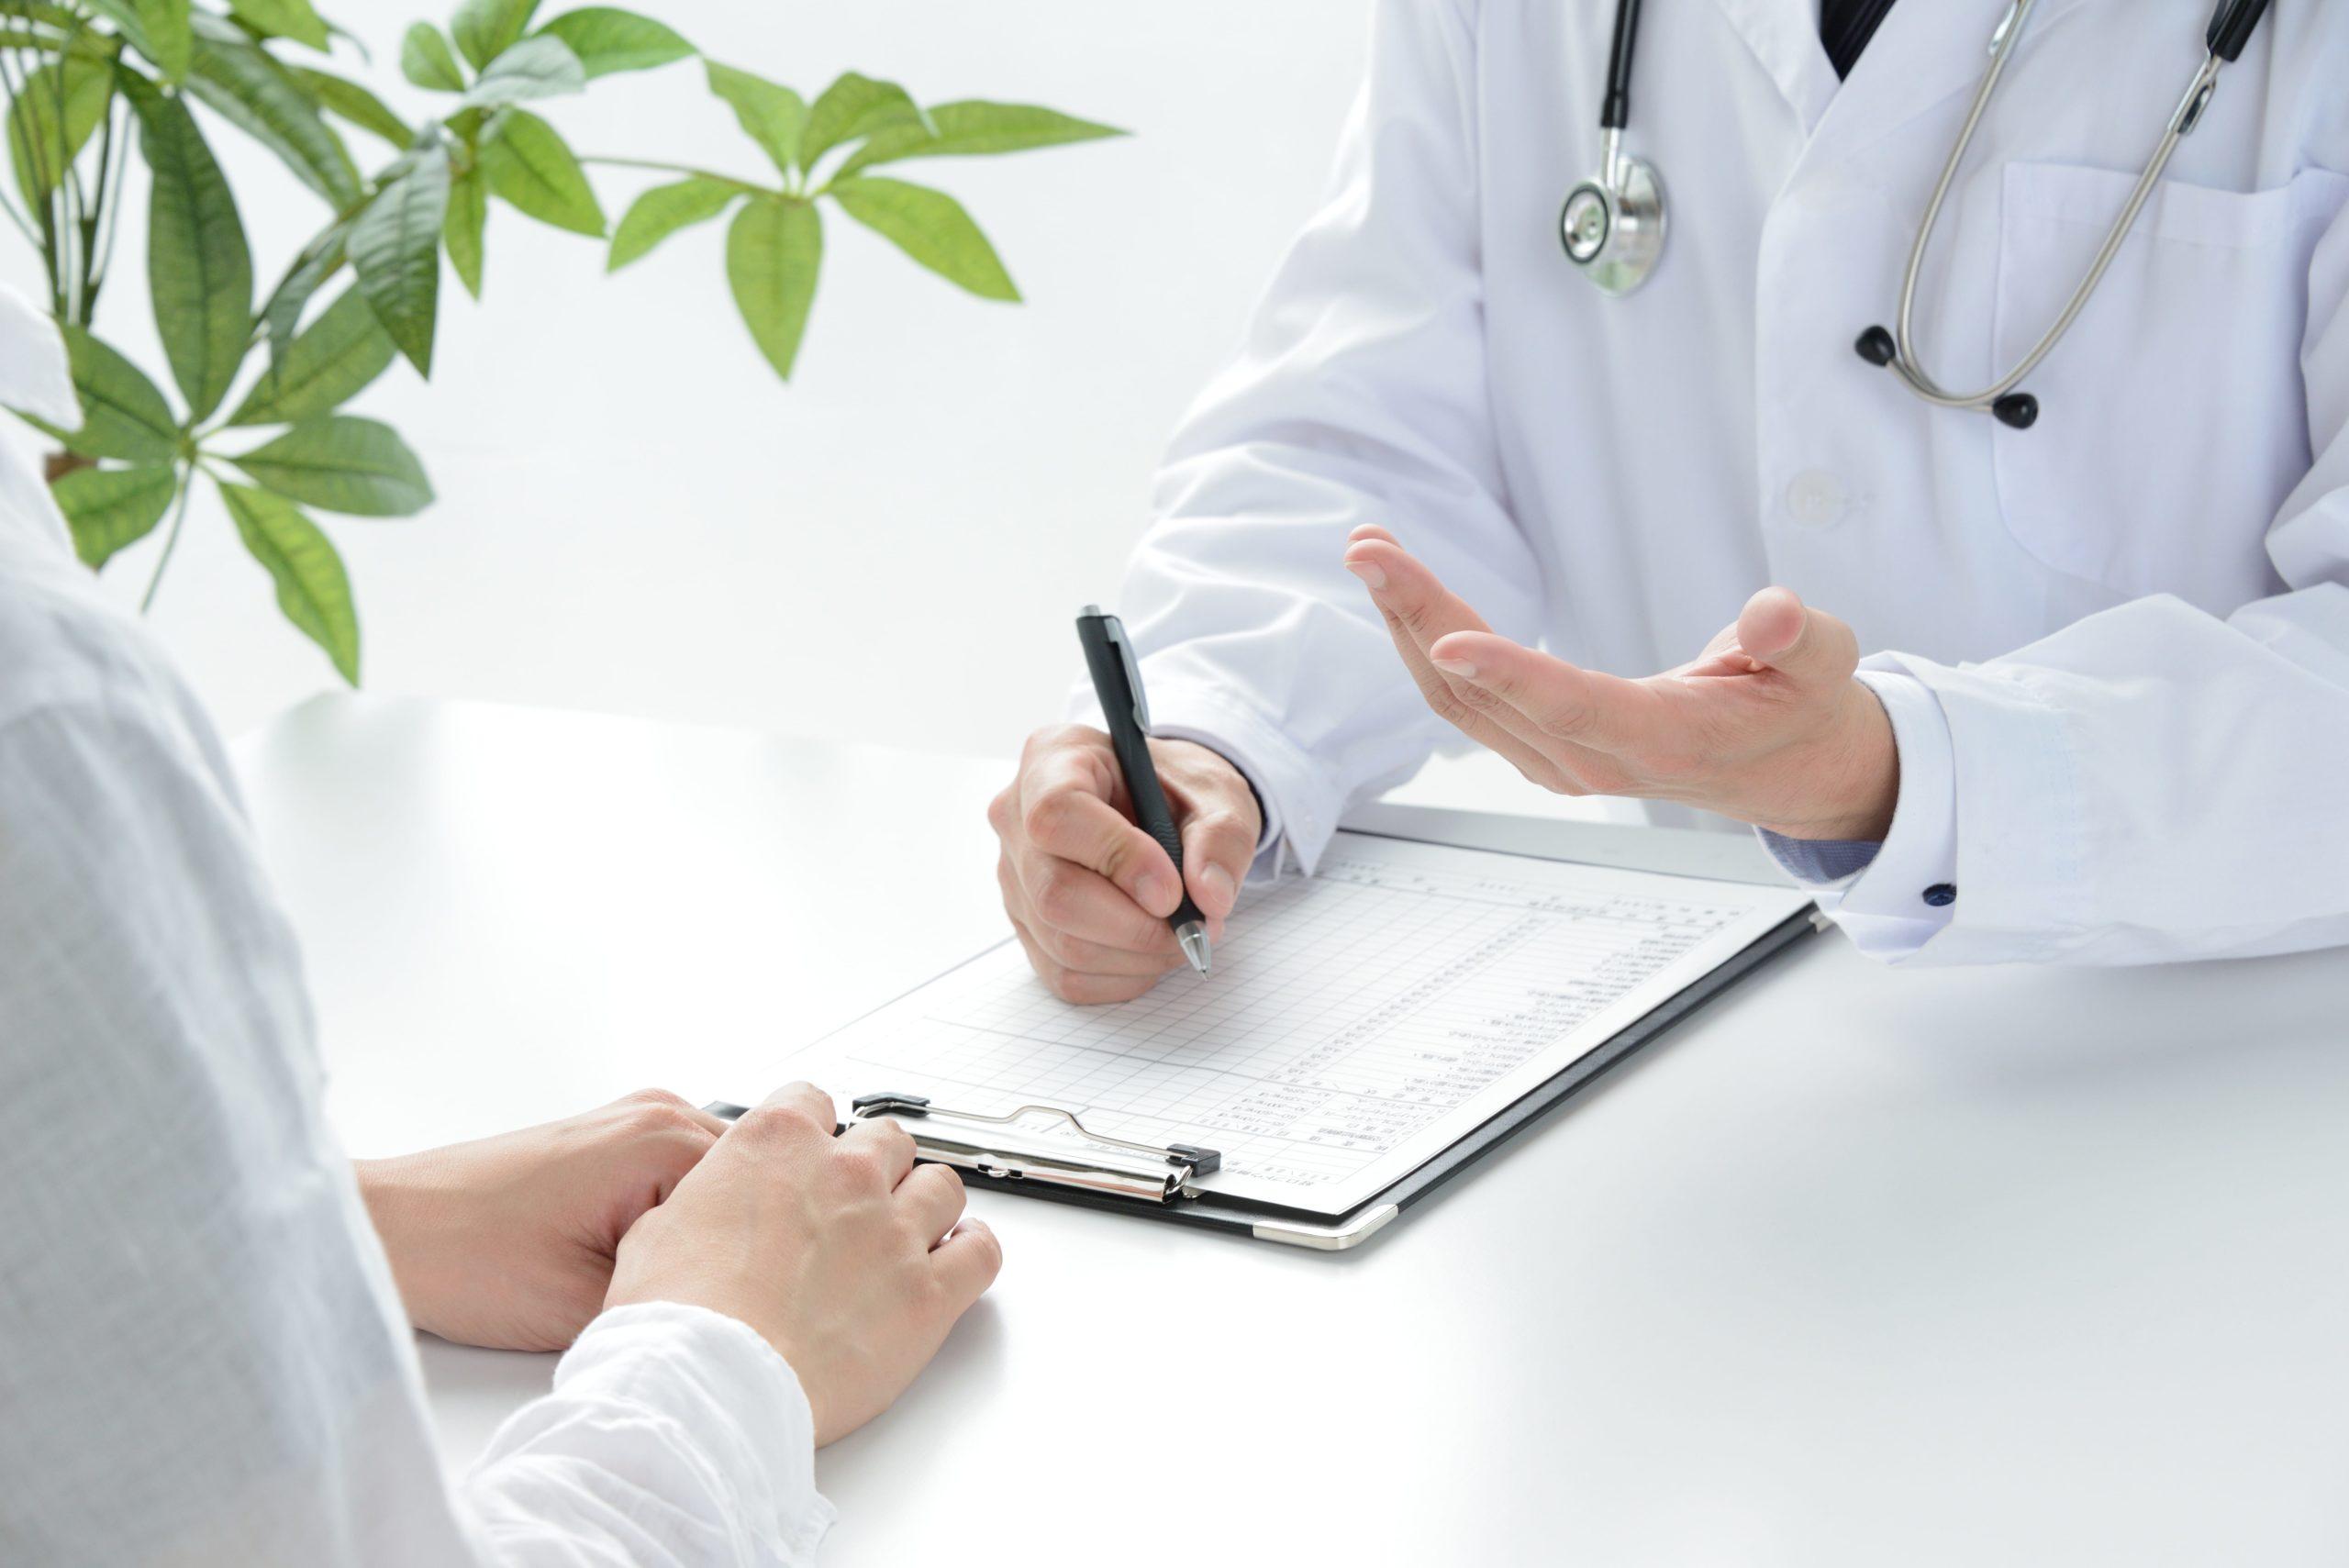 ¿A la espera del diagnóstico? Cosas a tener en cuenta